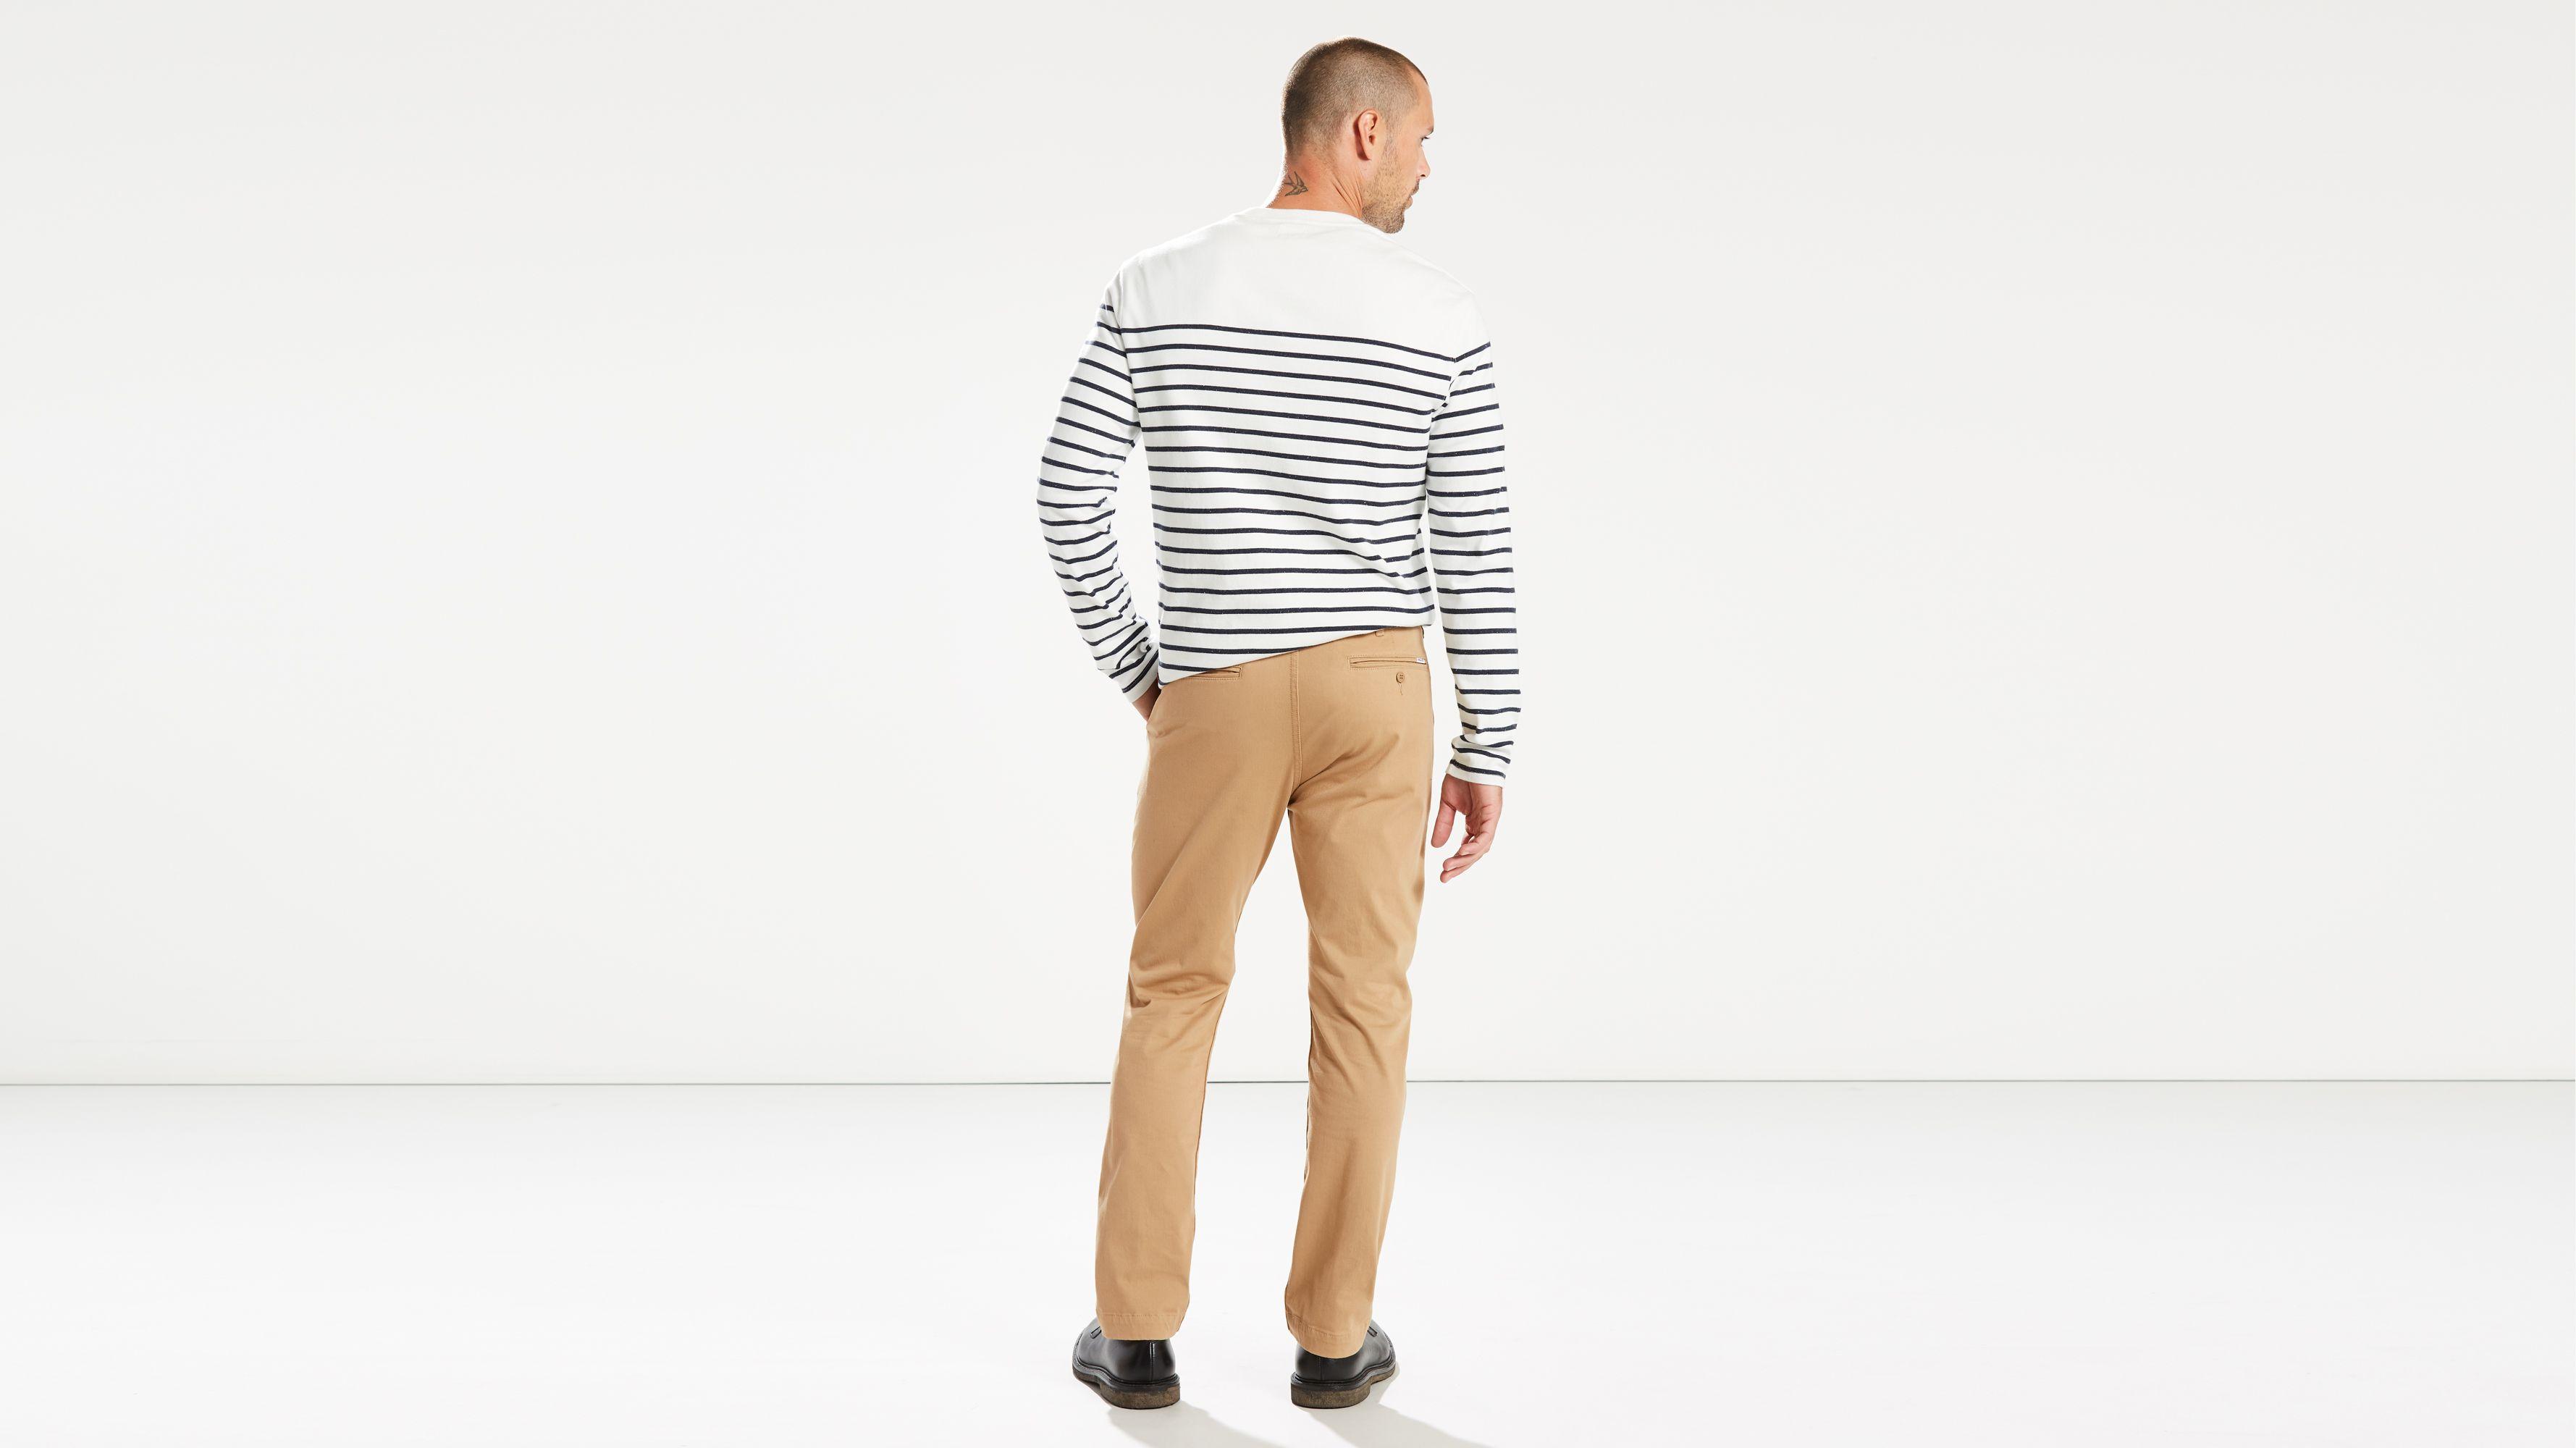 502T True Chino Trousers